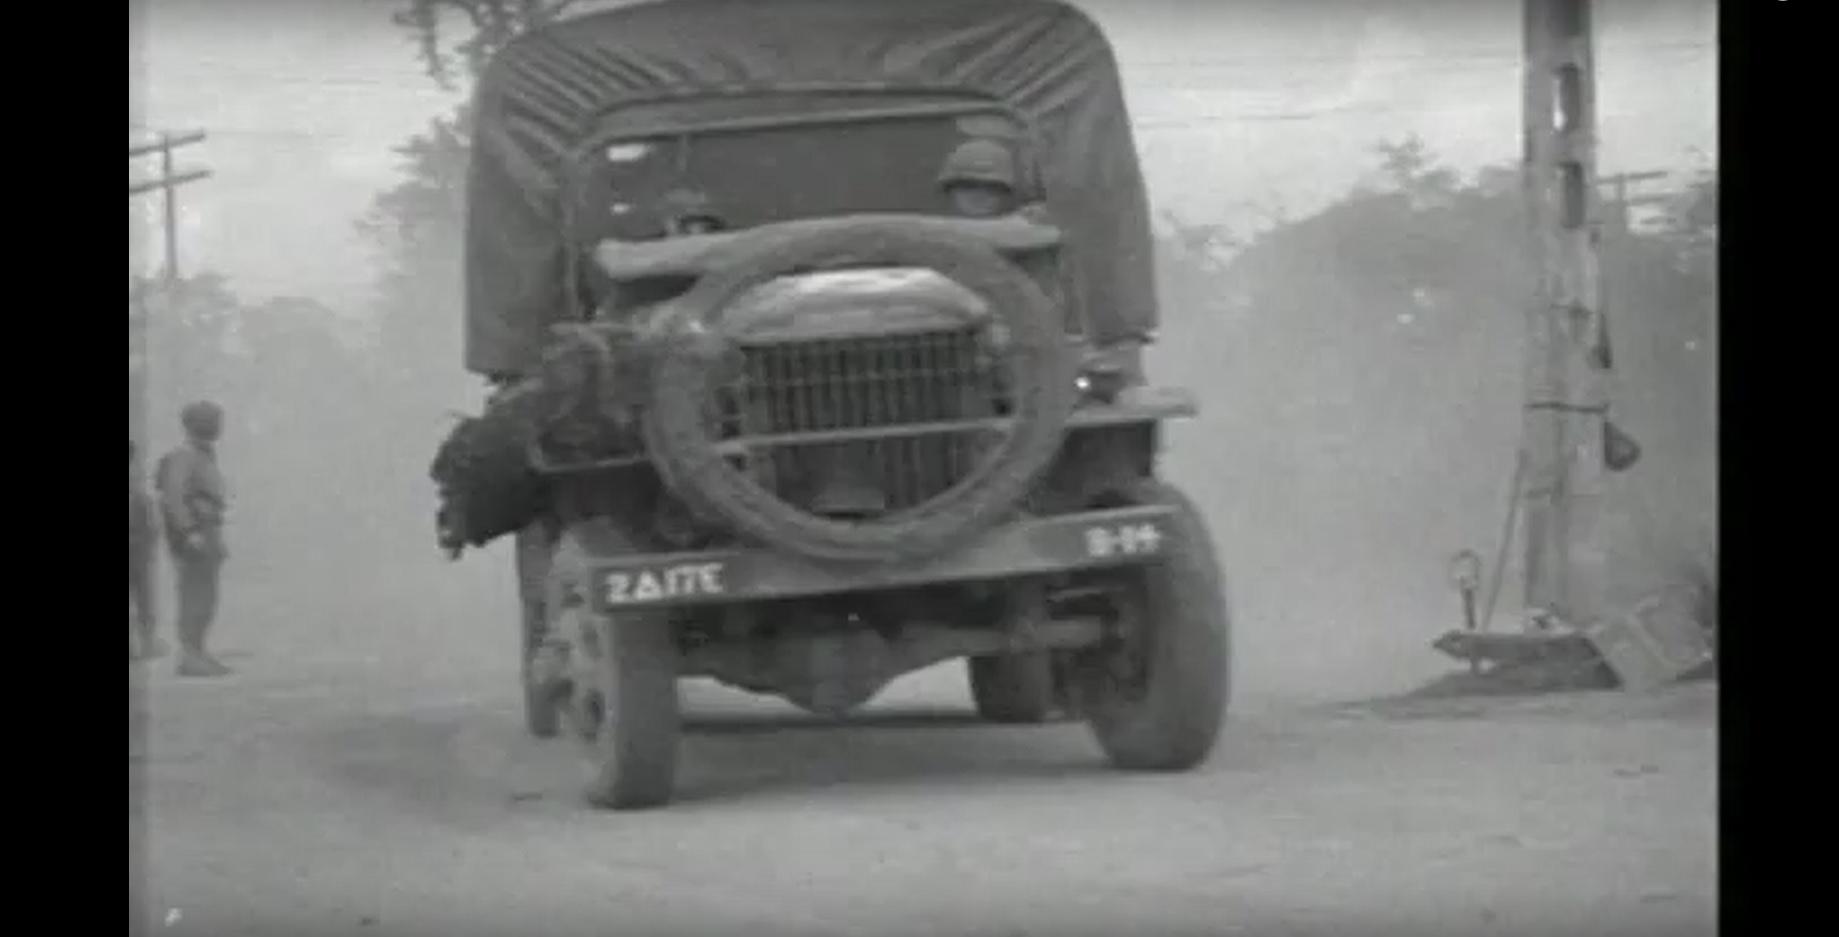 17th AEB truck Saint Jean de Daye Manche